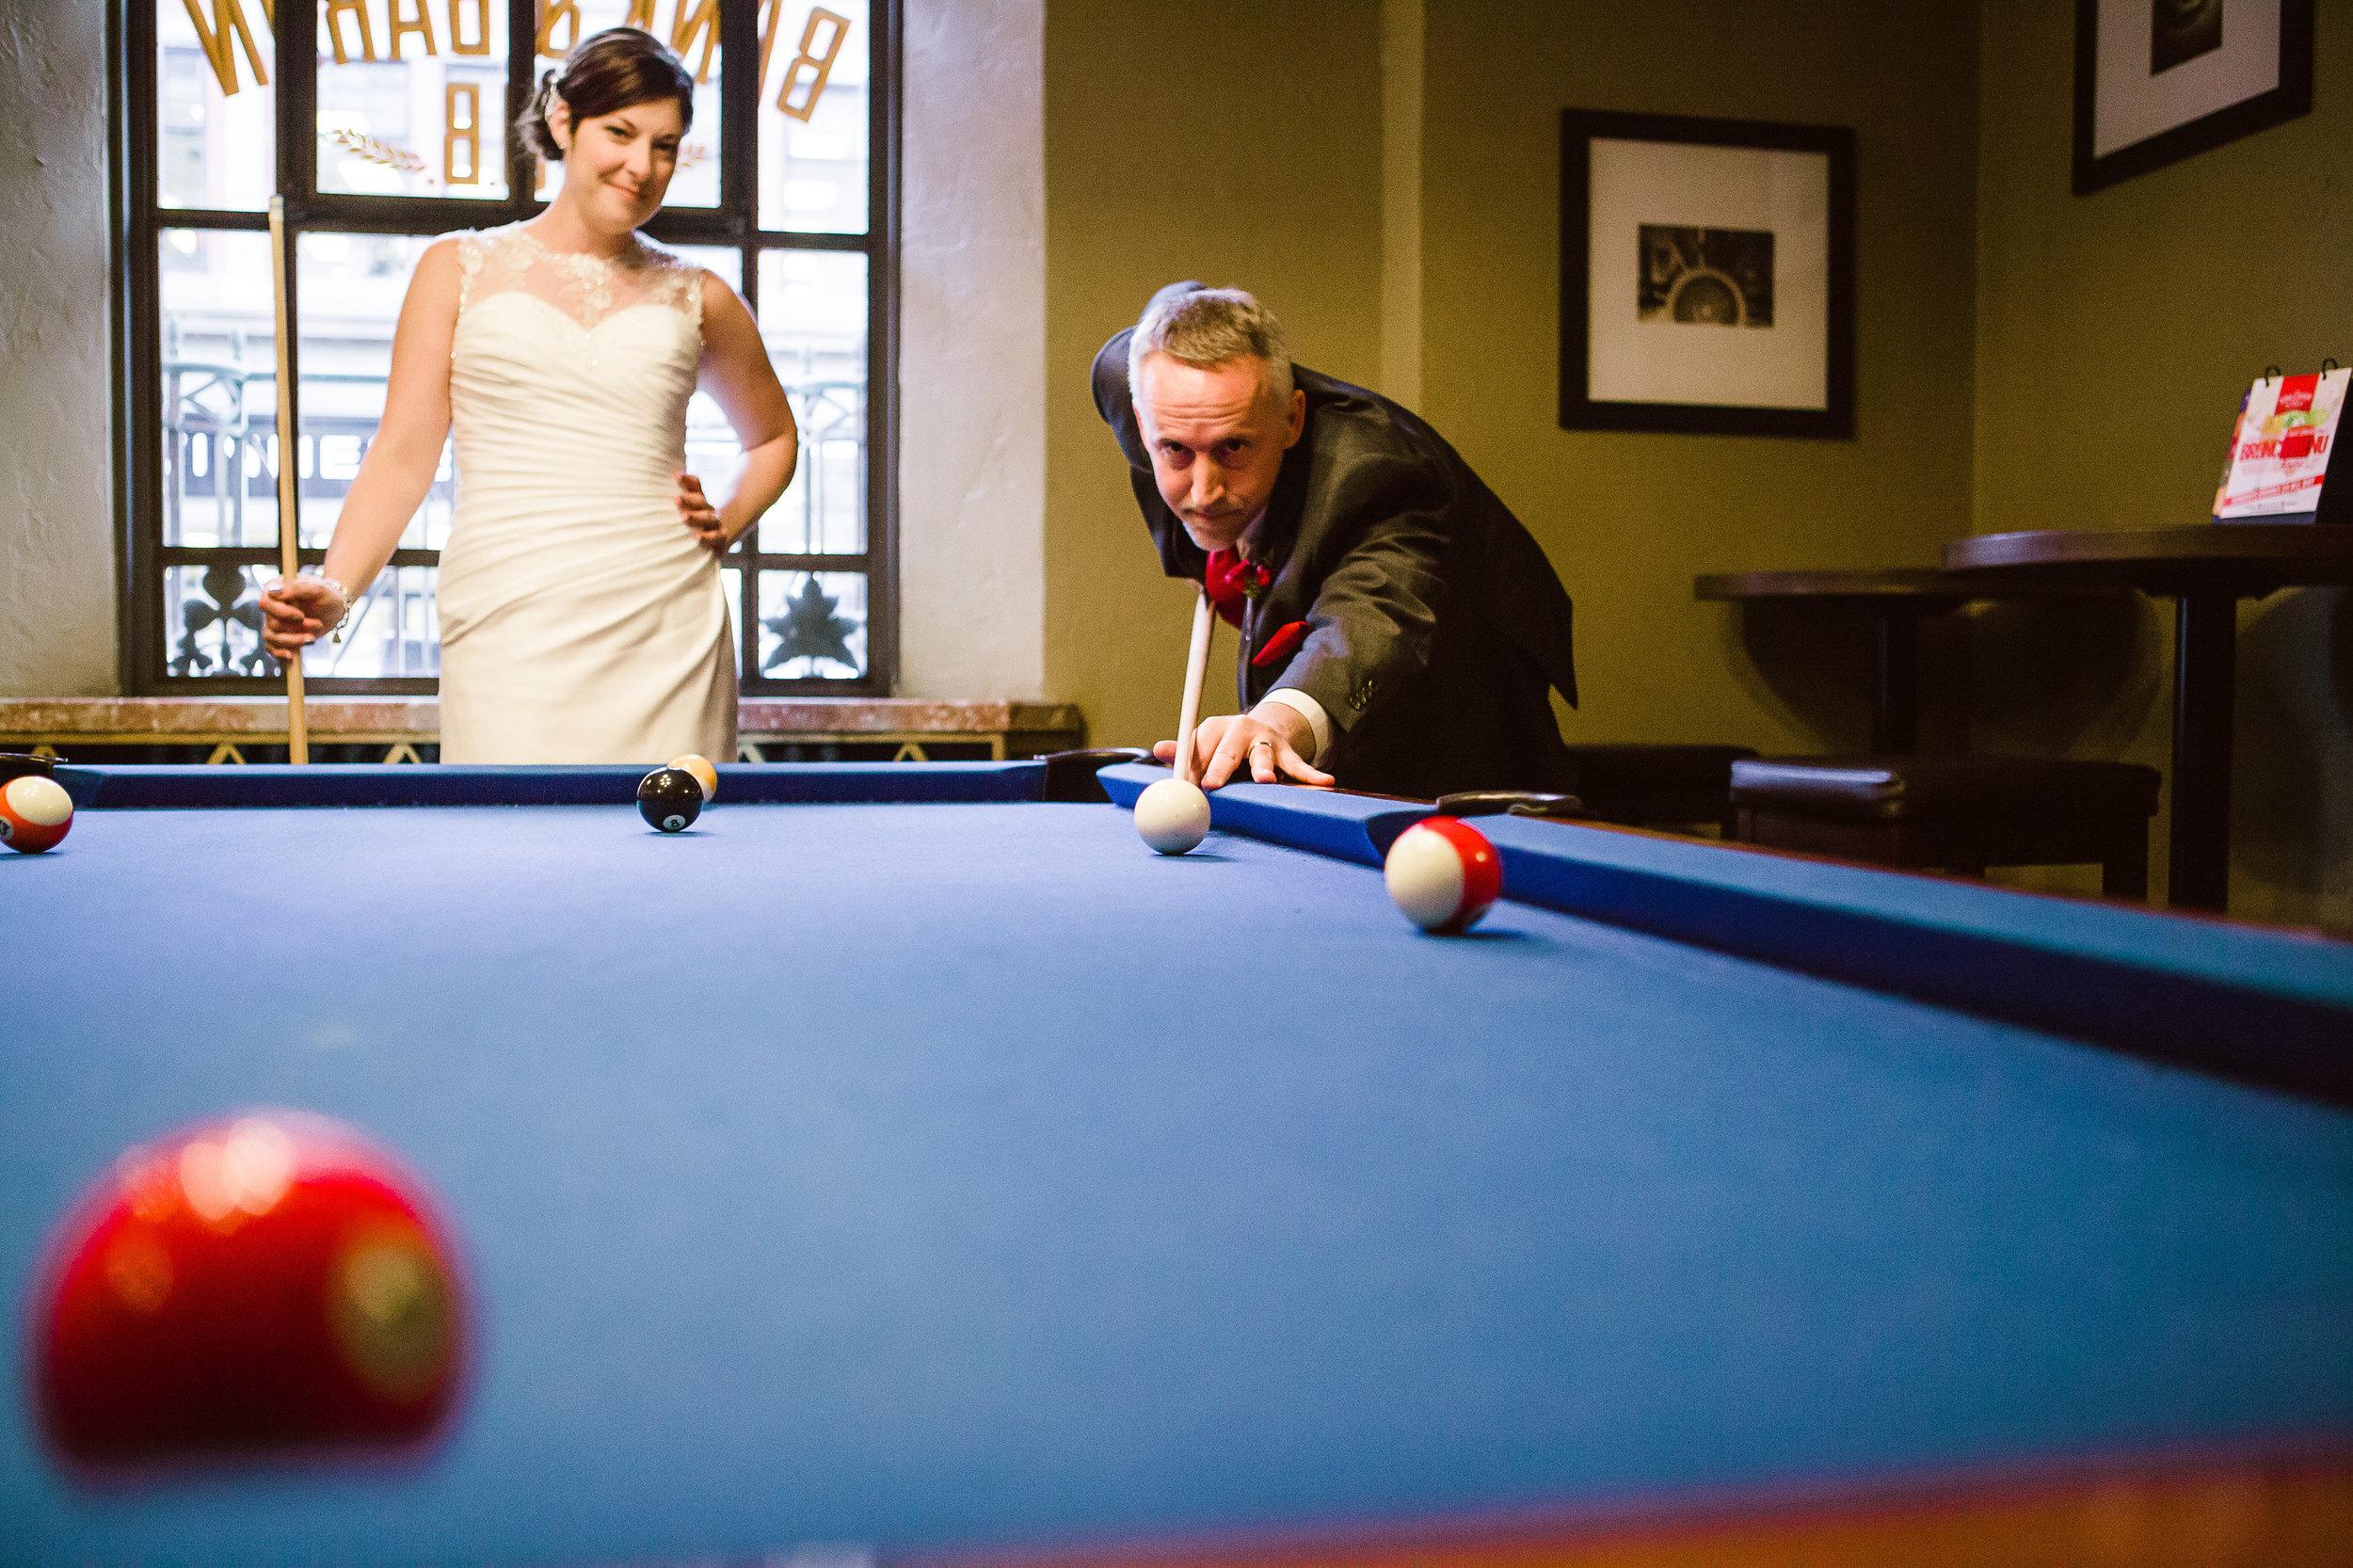 wedding day pool game